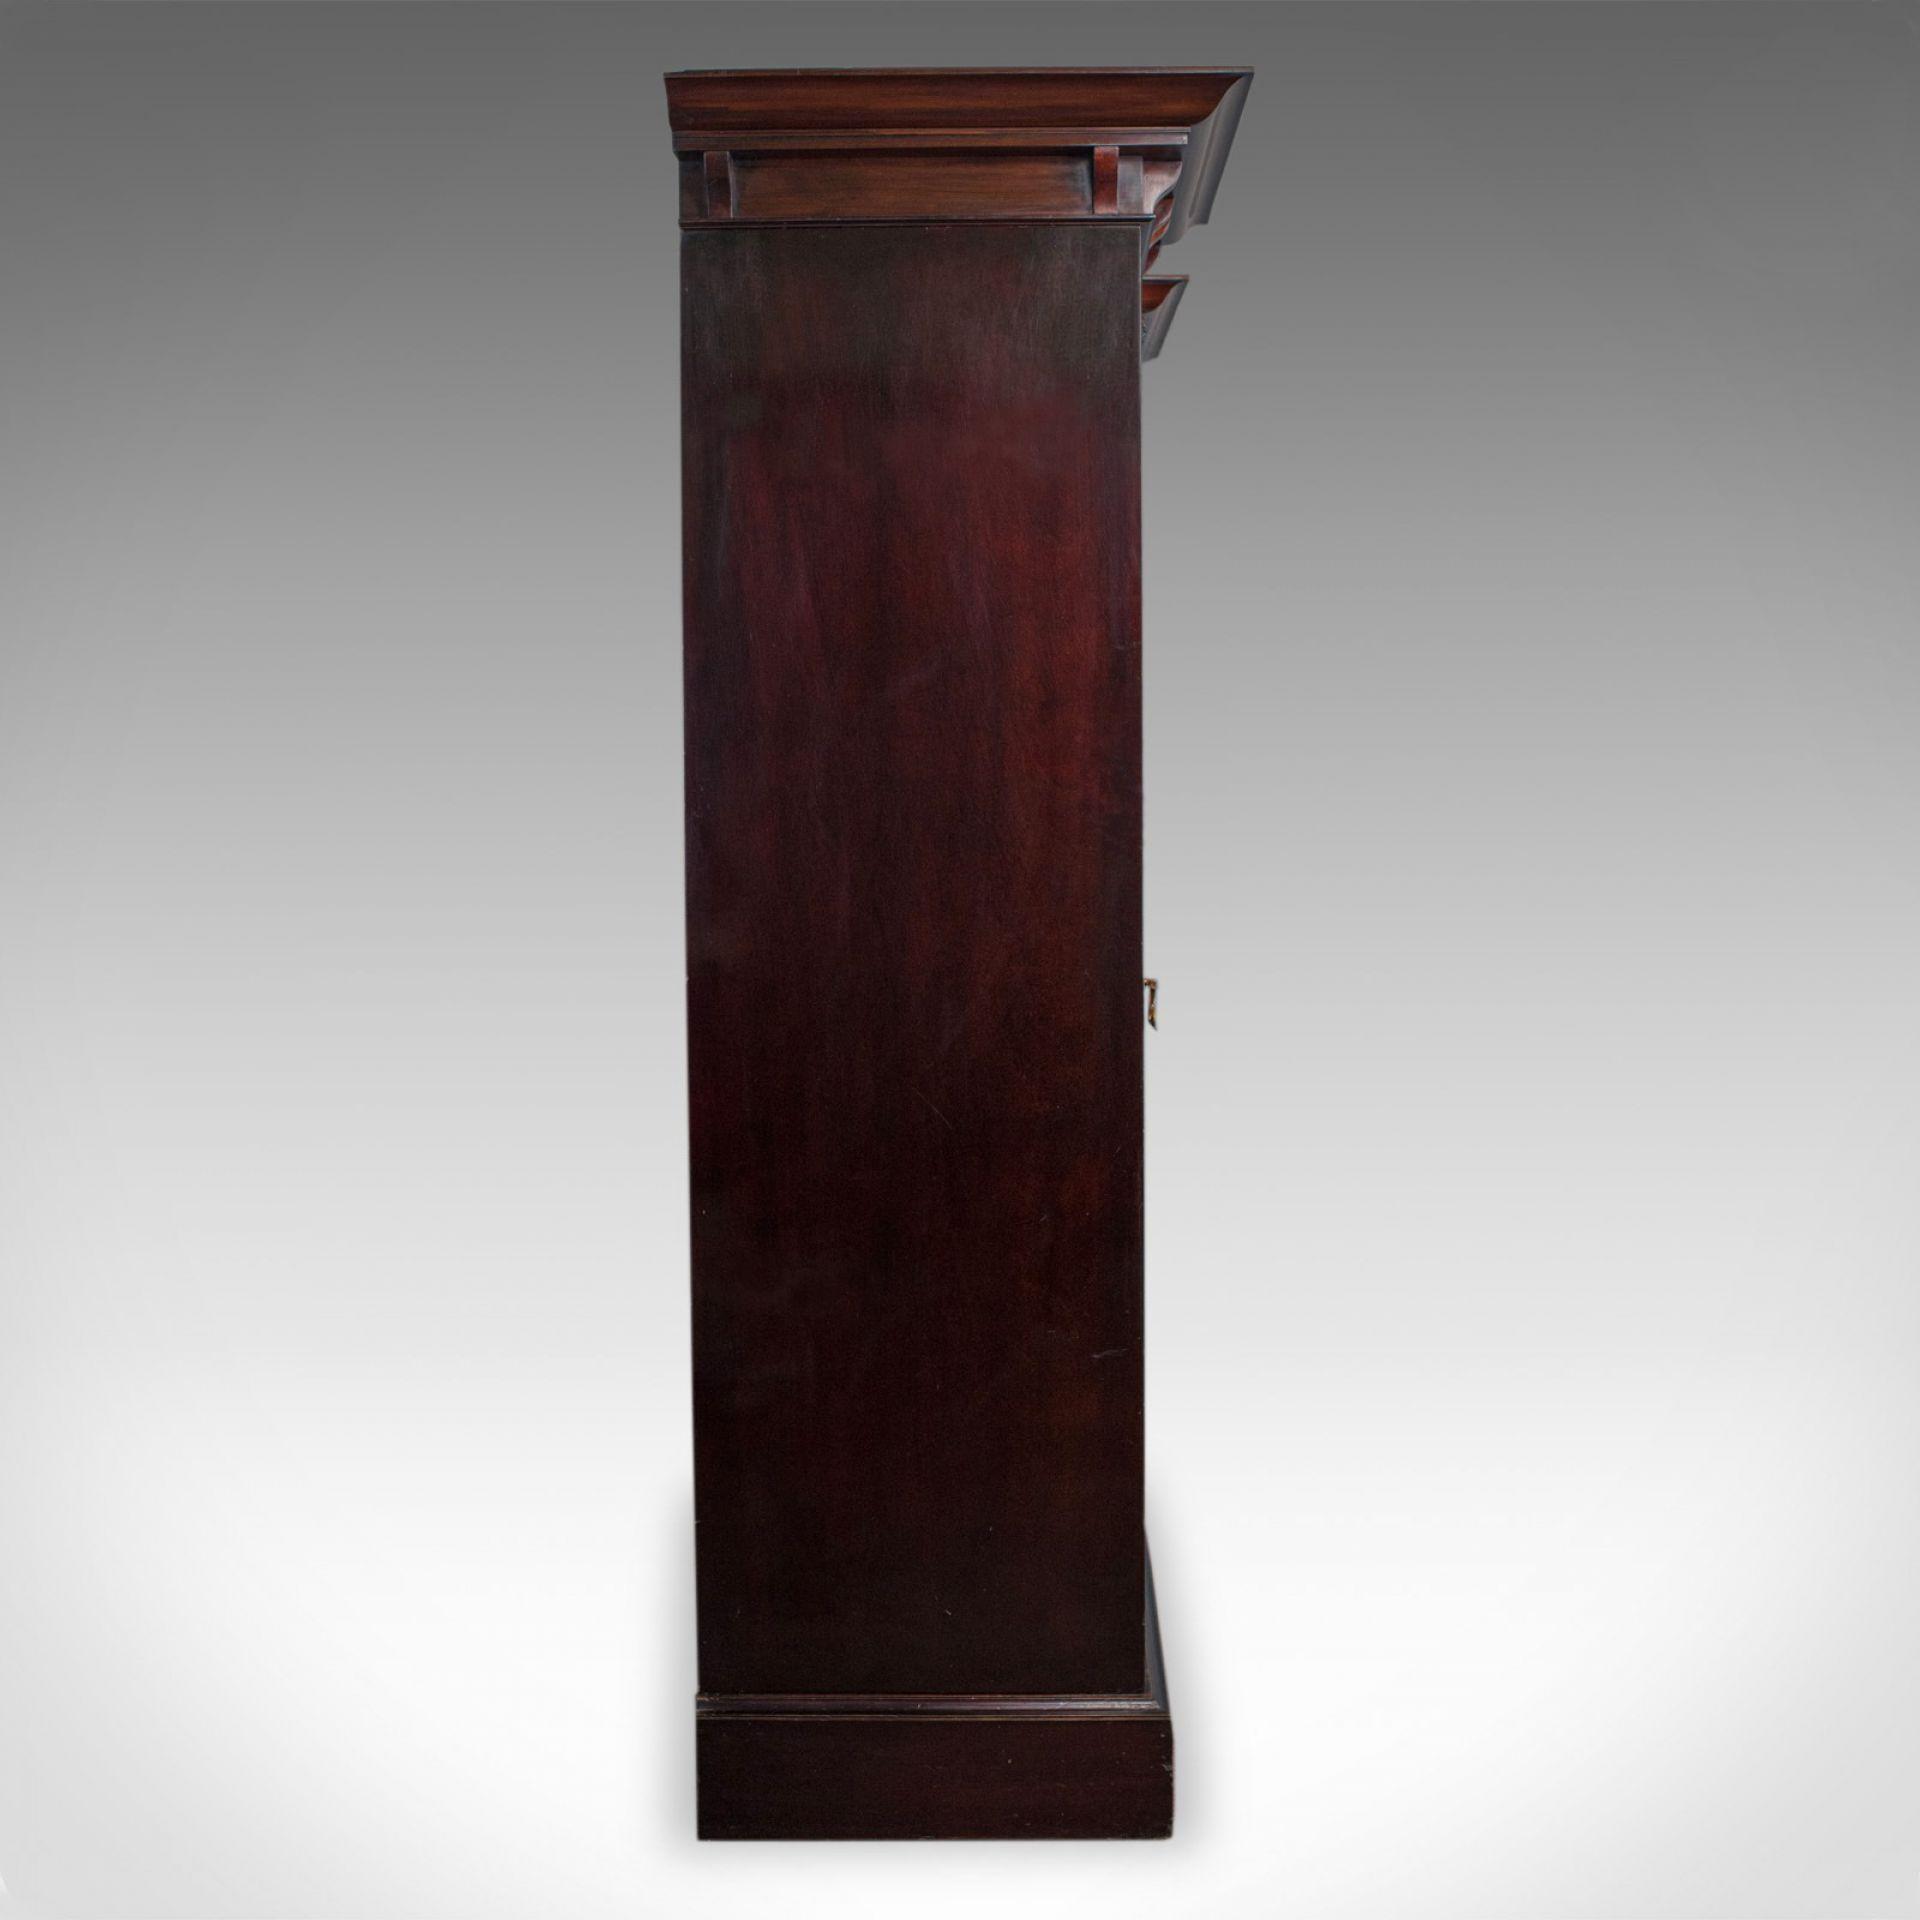 Antique Wardrobe, Maple and Co, English, Mahogany, Victorian, Art Nouveau C.1880